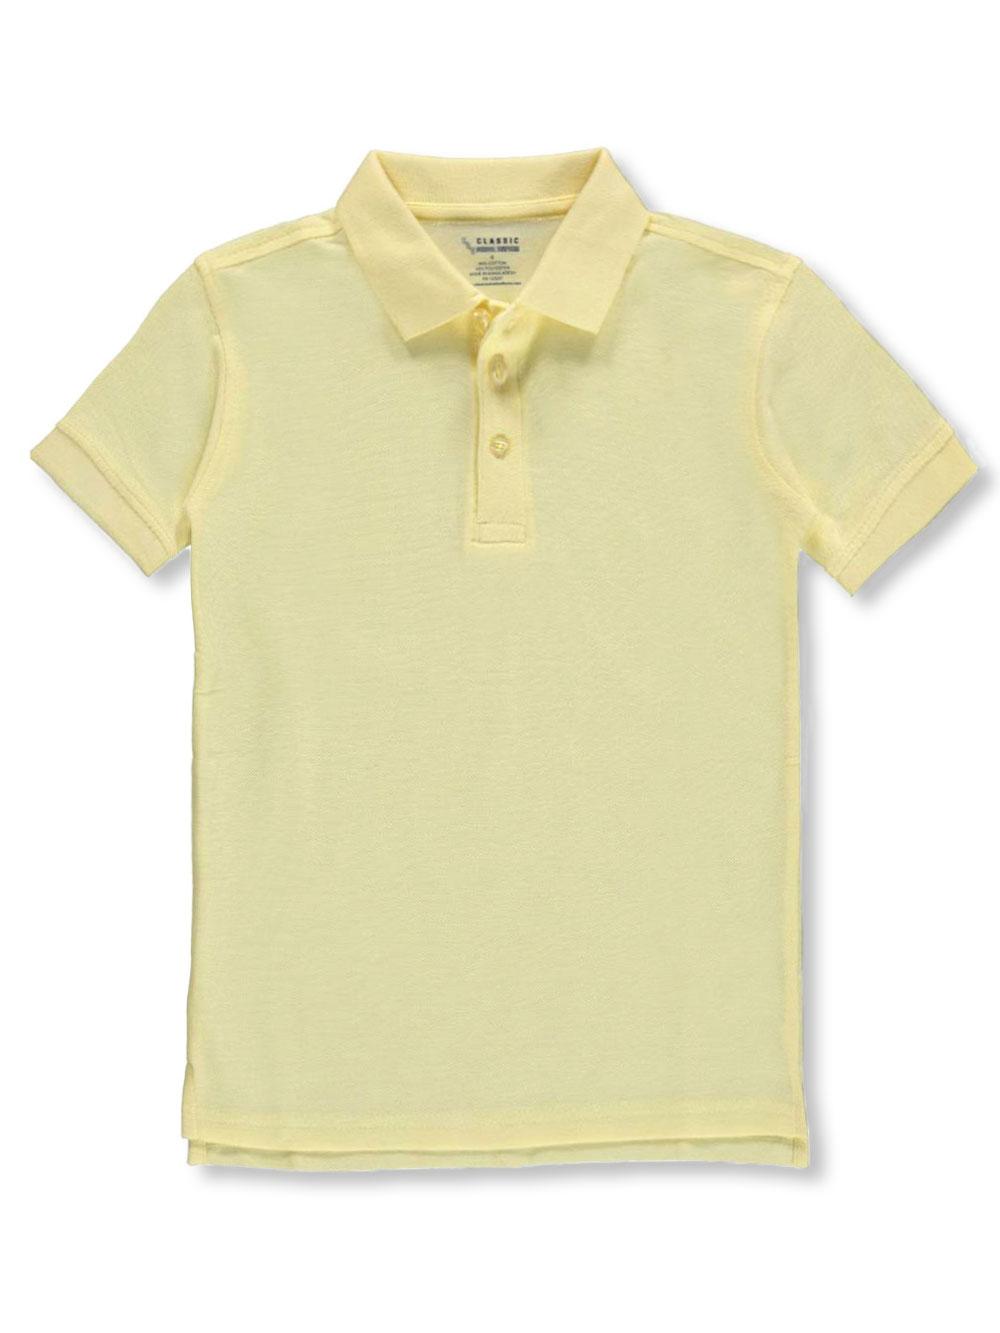 Classic School Uniform Big Boys' Pique Polo (Sizes 8 - 20) - yellow, 14